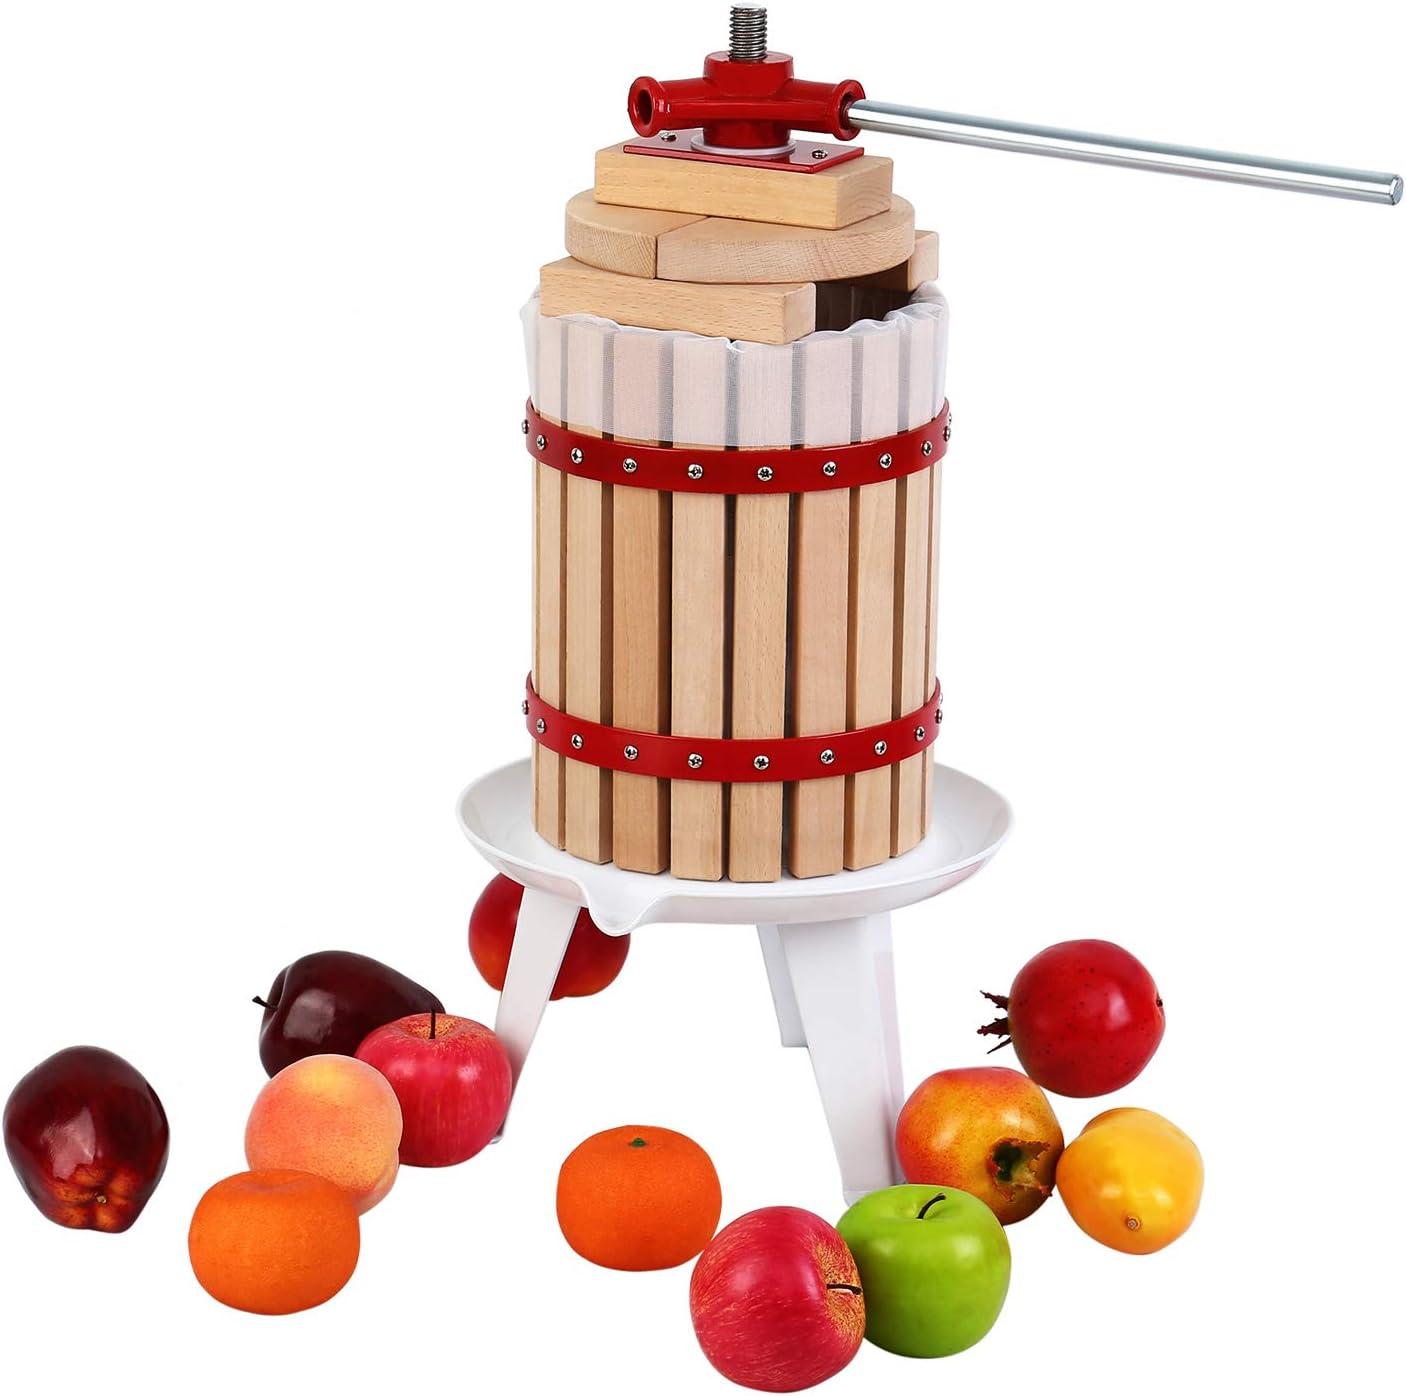 XuanYue 1.6 Gallon Manual Fruit Wine Press with 8 Blocks 100% Nature Oak, Cider Apple Grape Berries Crusher Juice Maker